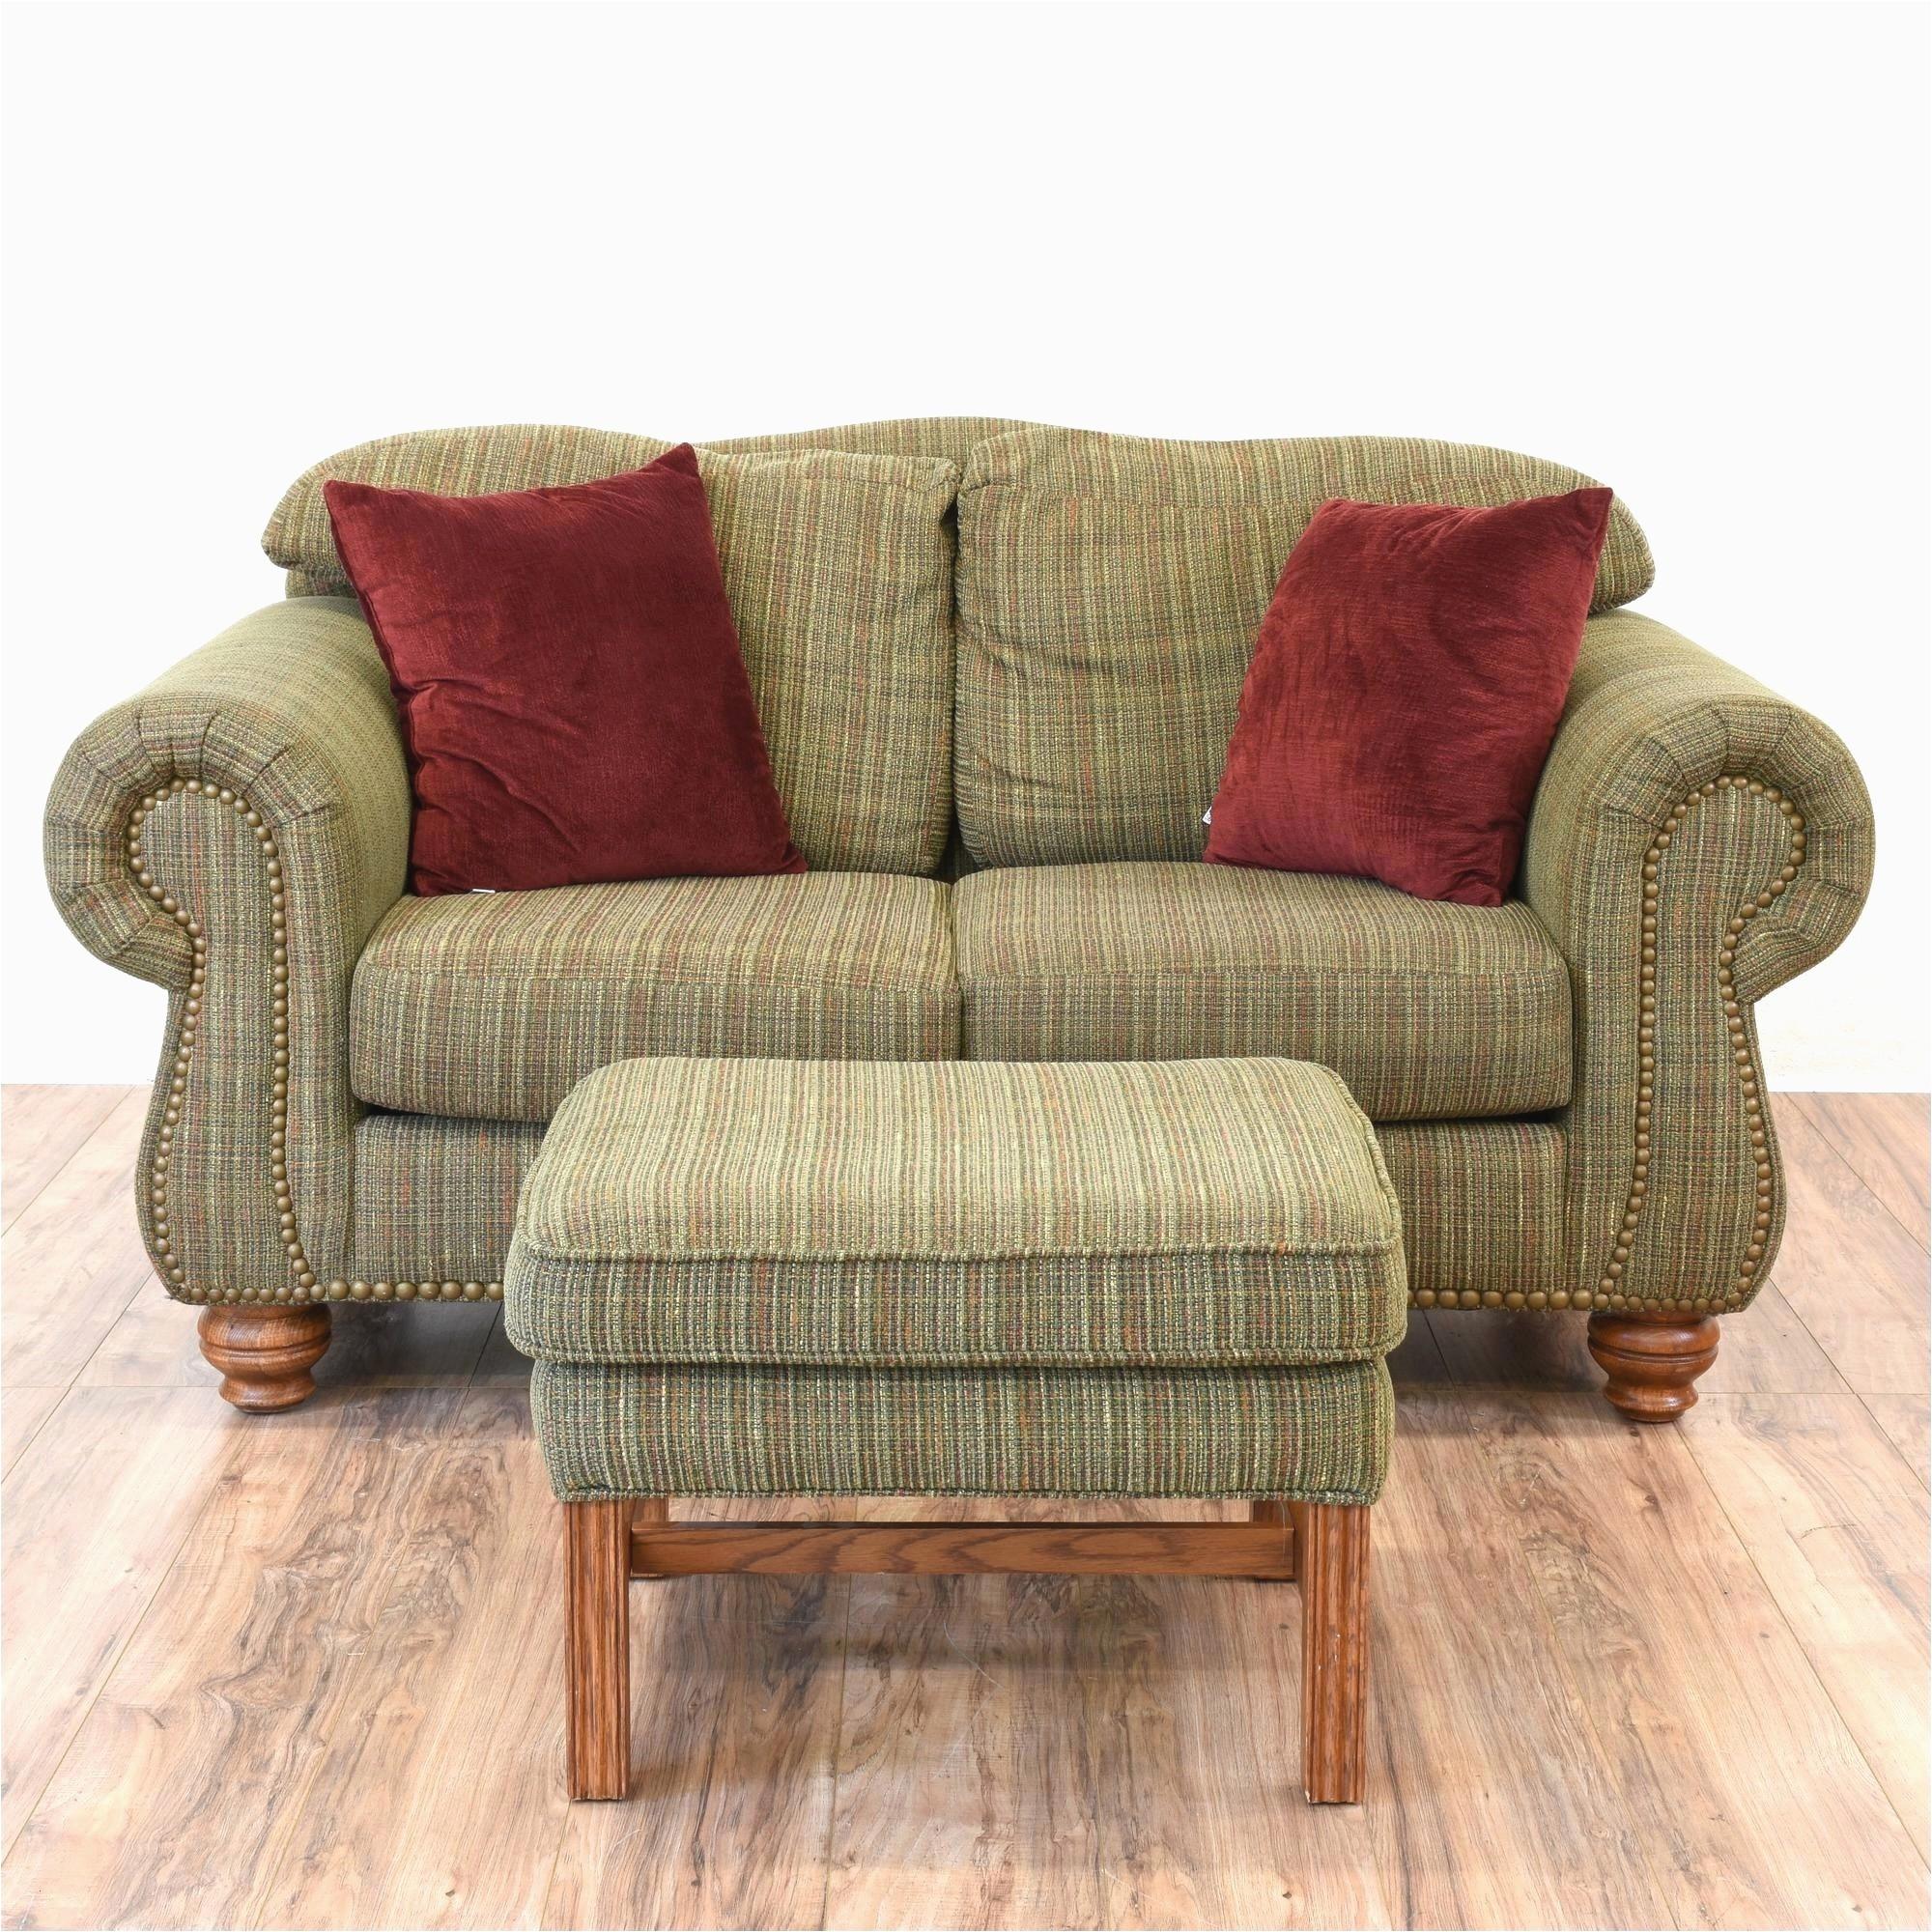 outdoor furniture elegant unique furniture stores 20 sofa table 0d scheme pool deck furniture